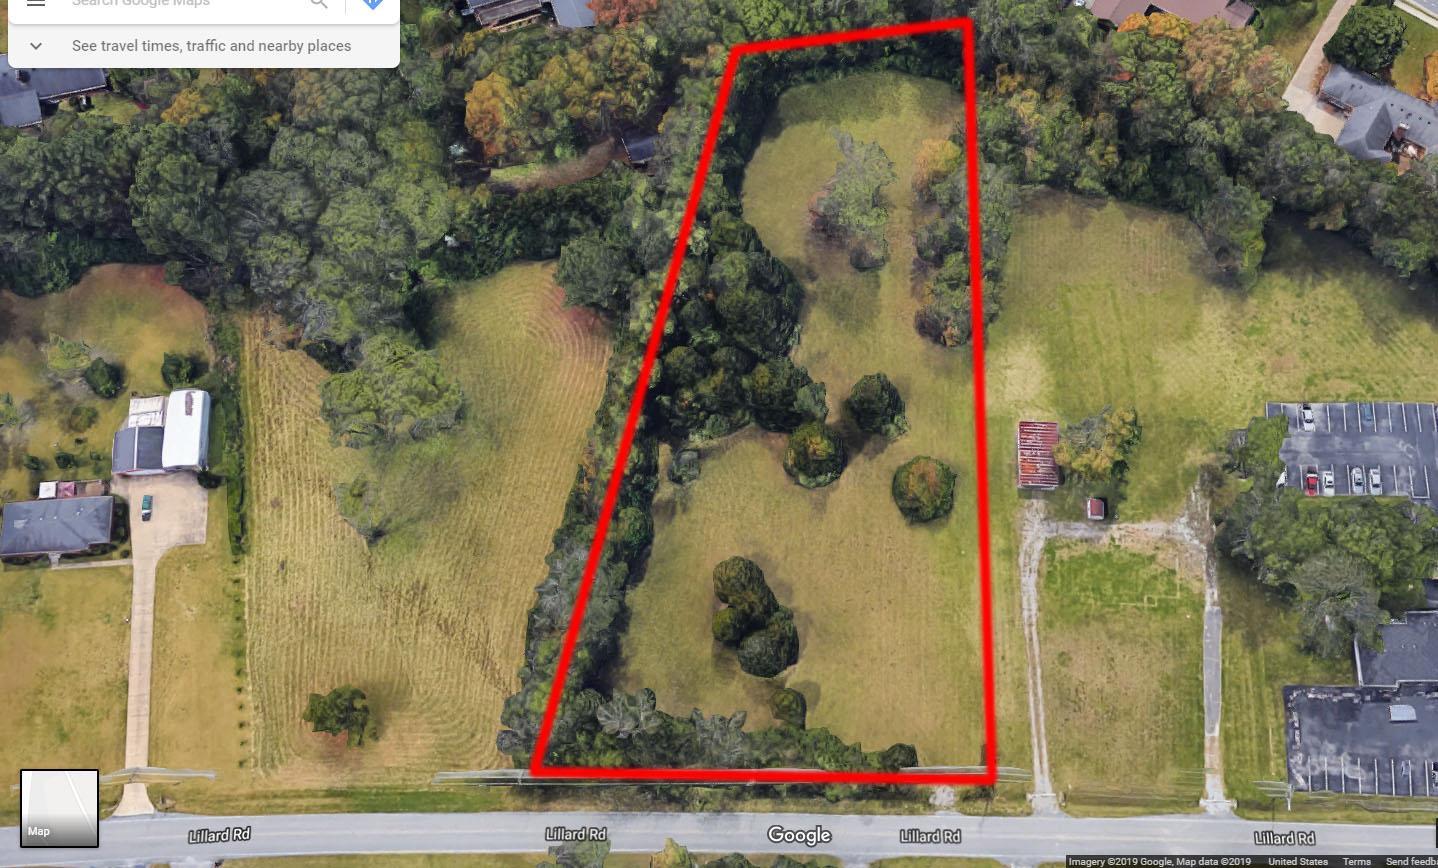 785 Lillard Rd, Murfreesboro, TN 37130 - Murfreesboro, TN real estate listing